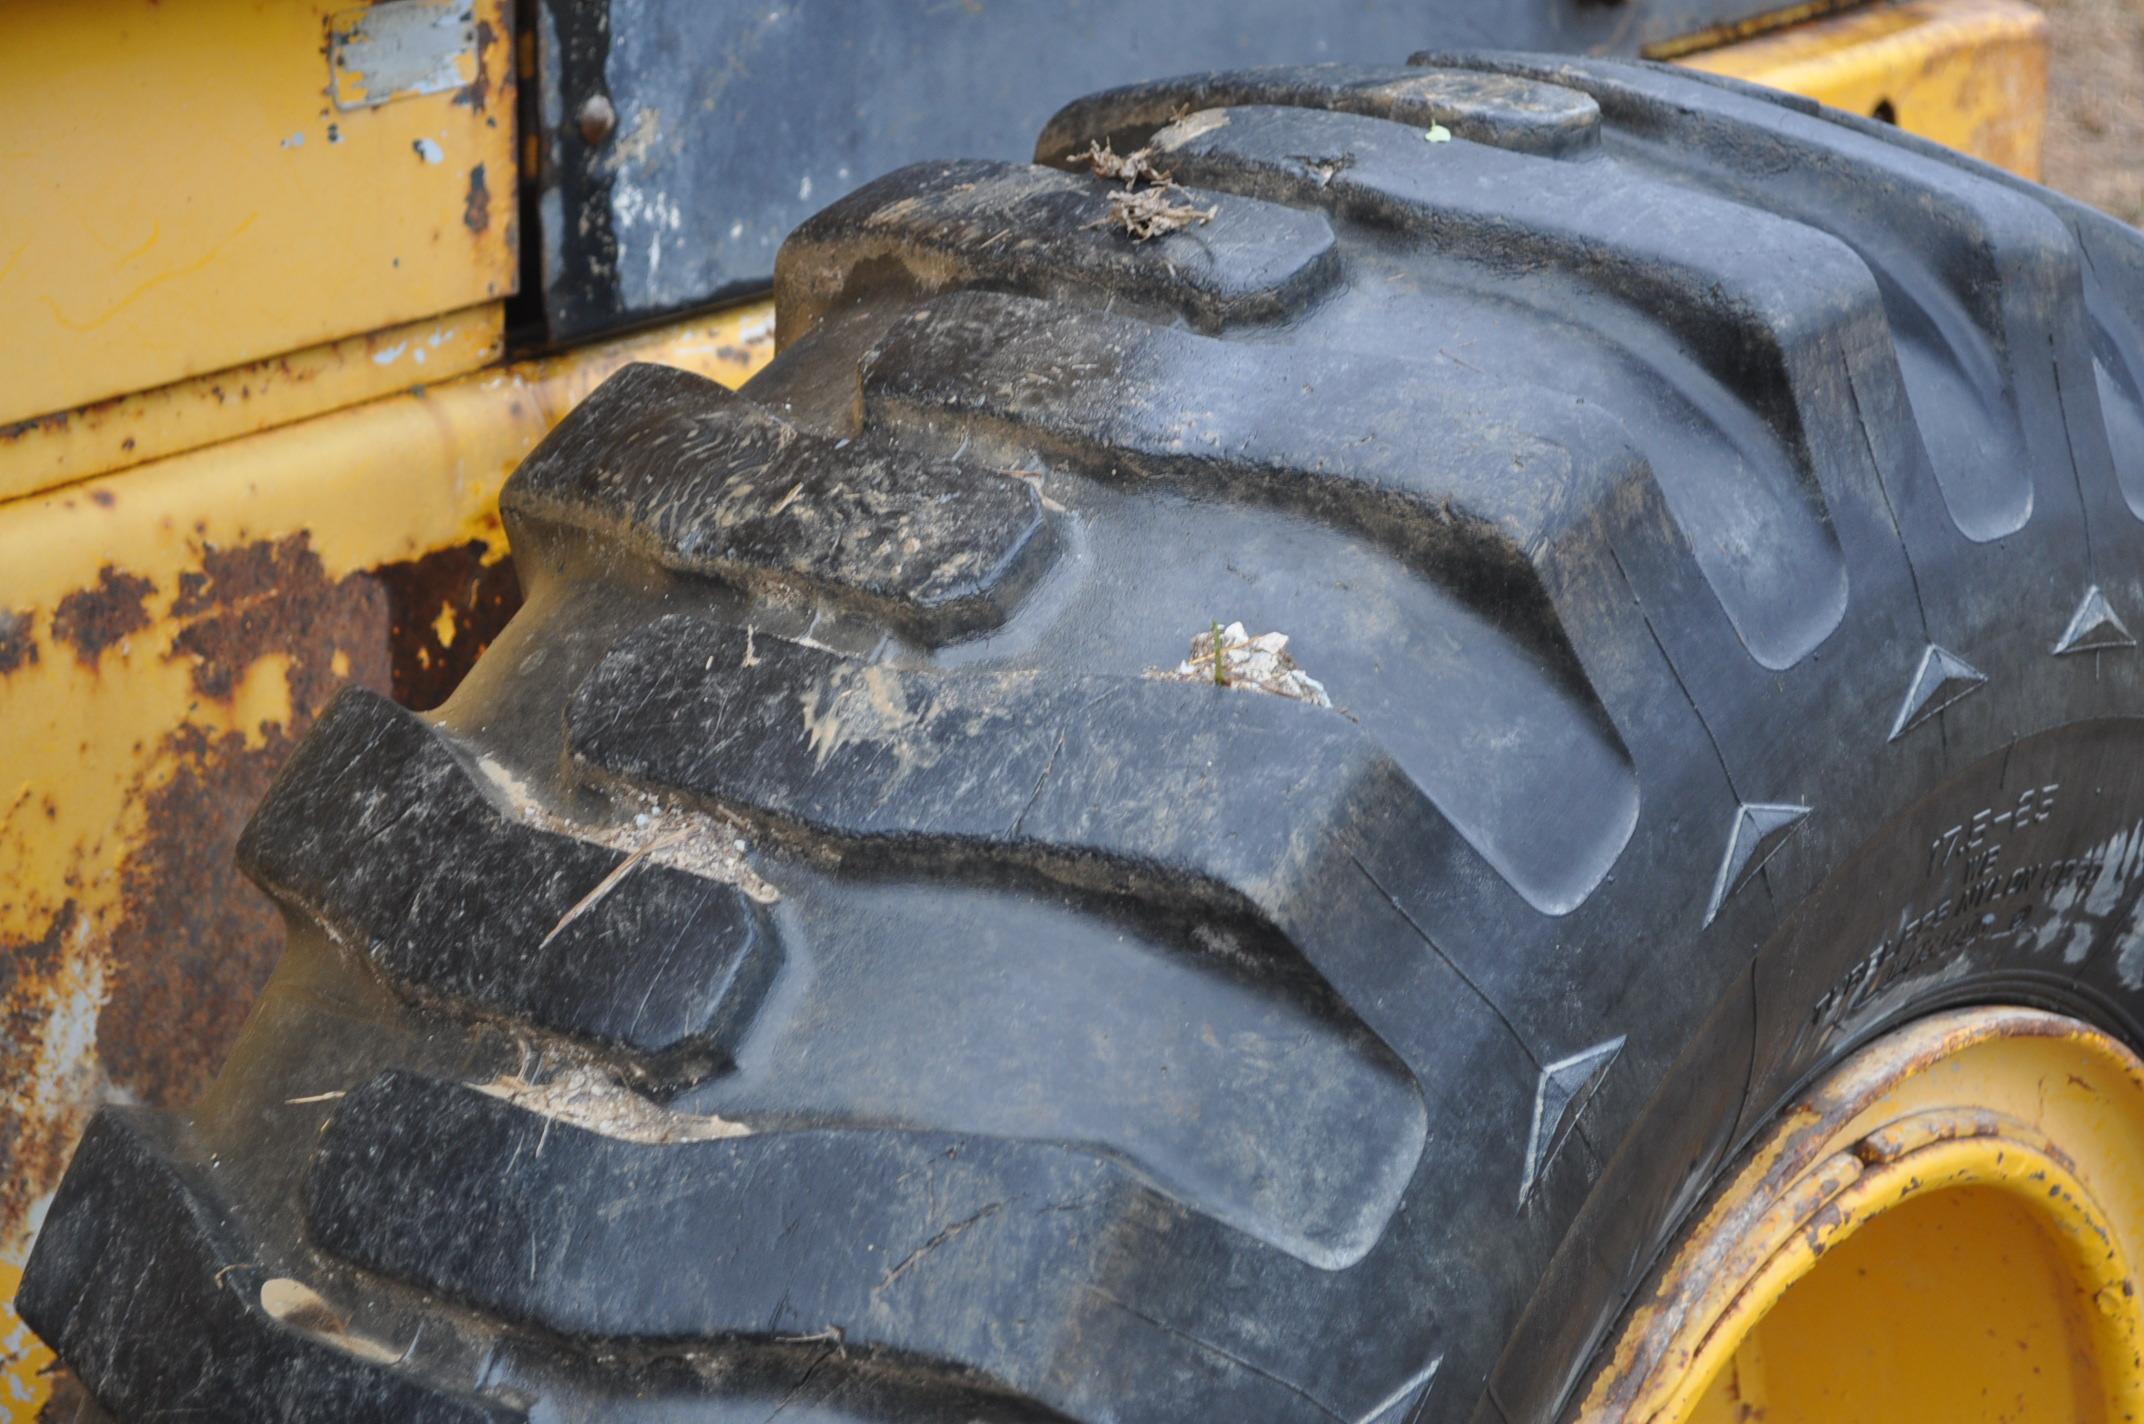 John Deere 544 Payloader, 17.5-25 tires, shows 1074 hrs, SN 0767621 - Image 7 of 16